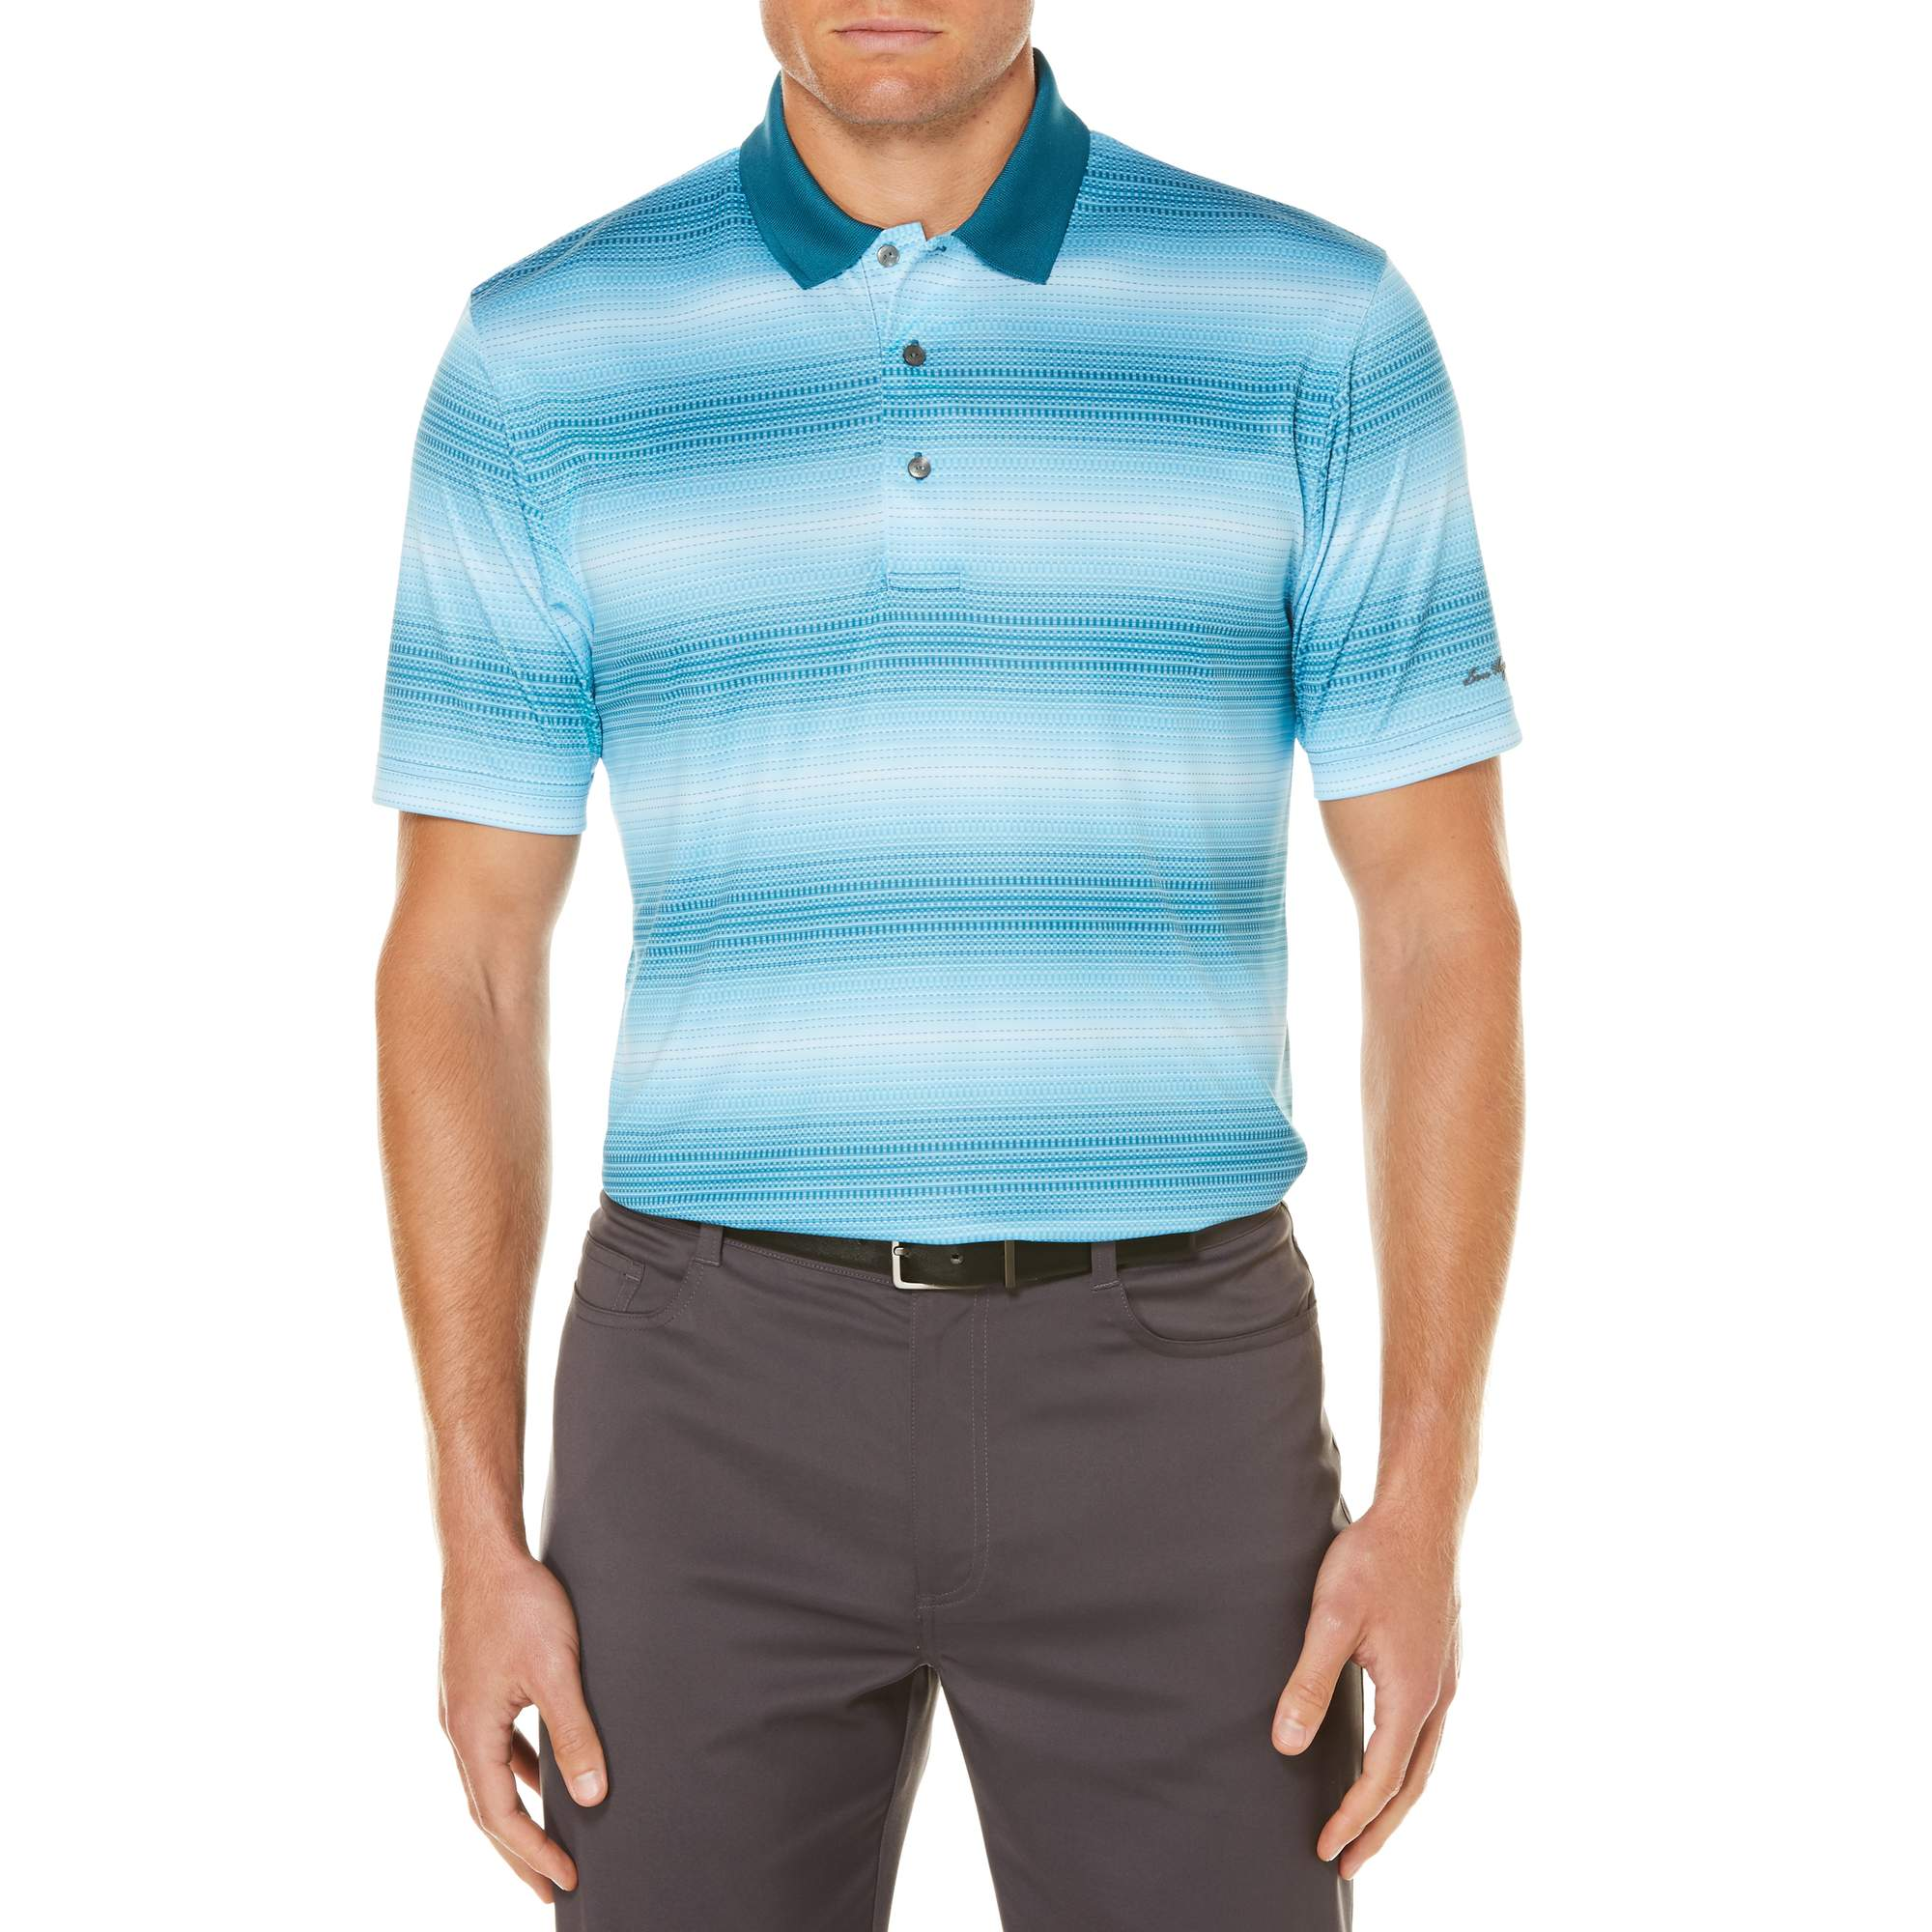 Men's Performance Short Sleeve Tonal Stripe Polo Shirt